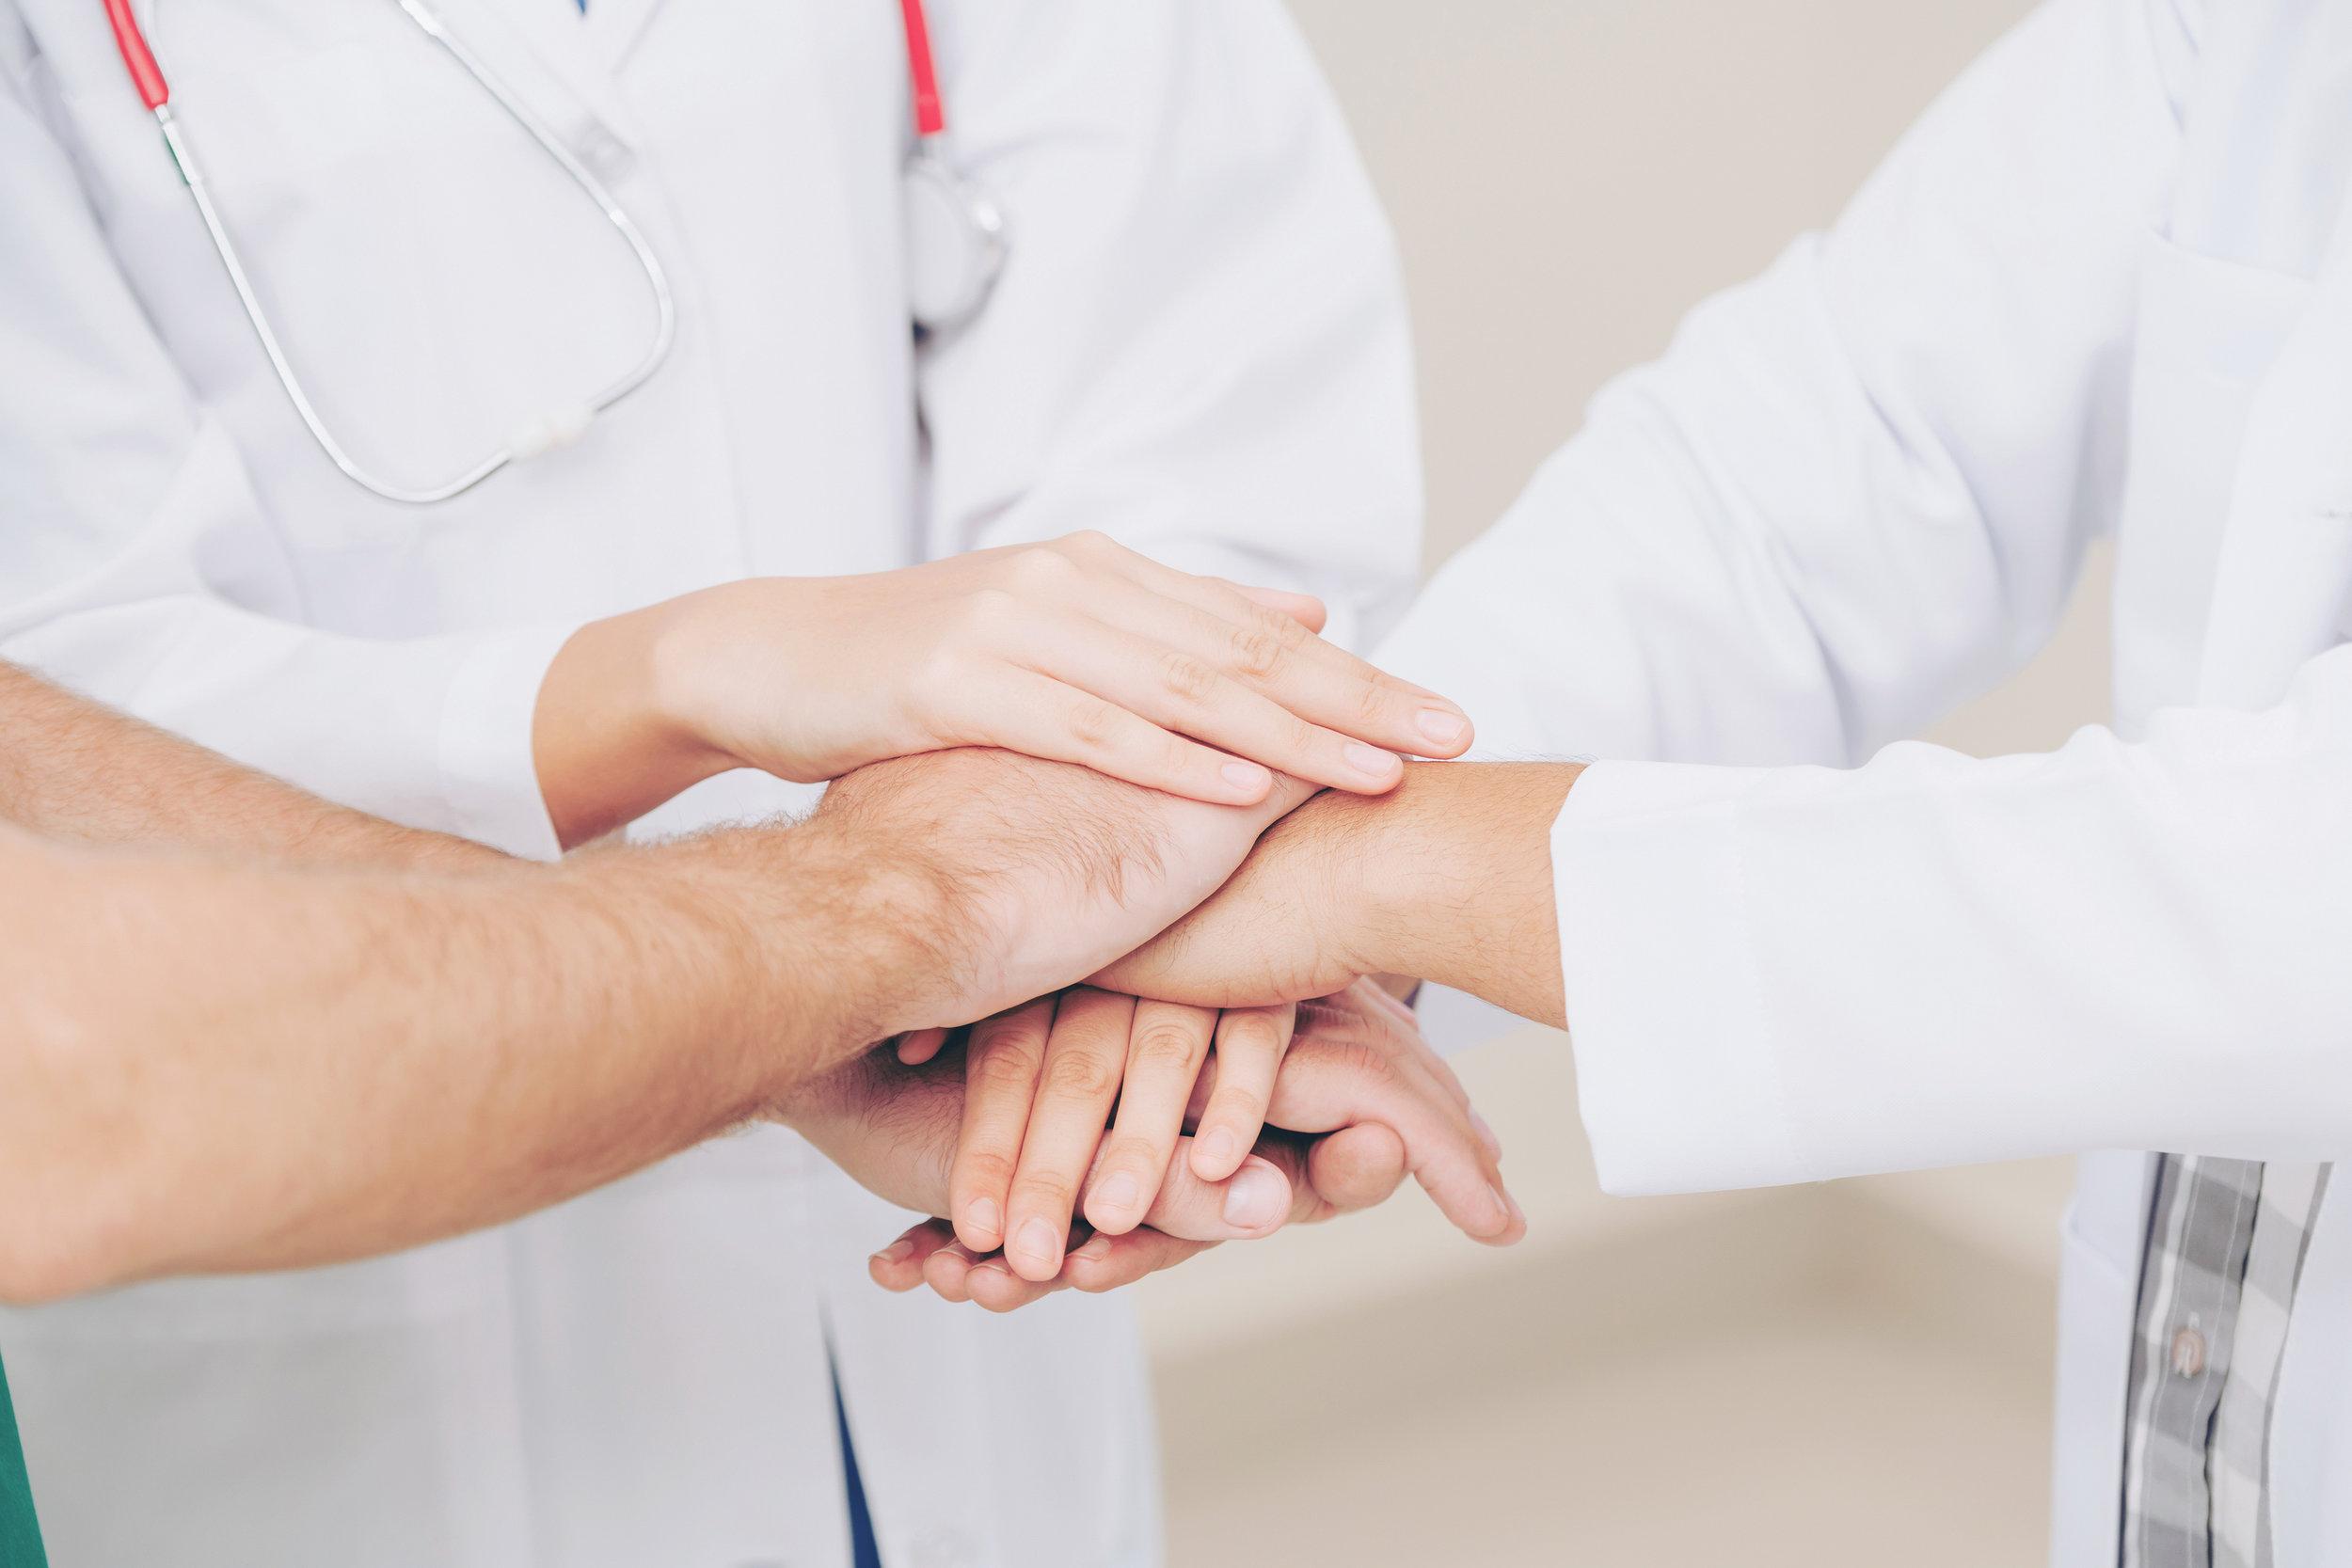 bigstock-Doctor-Surgeon-And-Nurse-Join-298269445.jpg